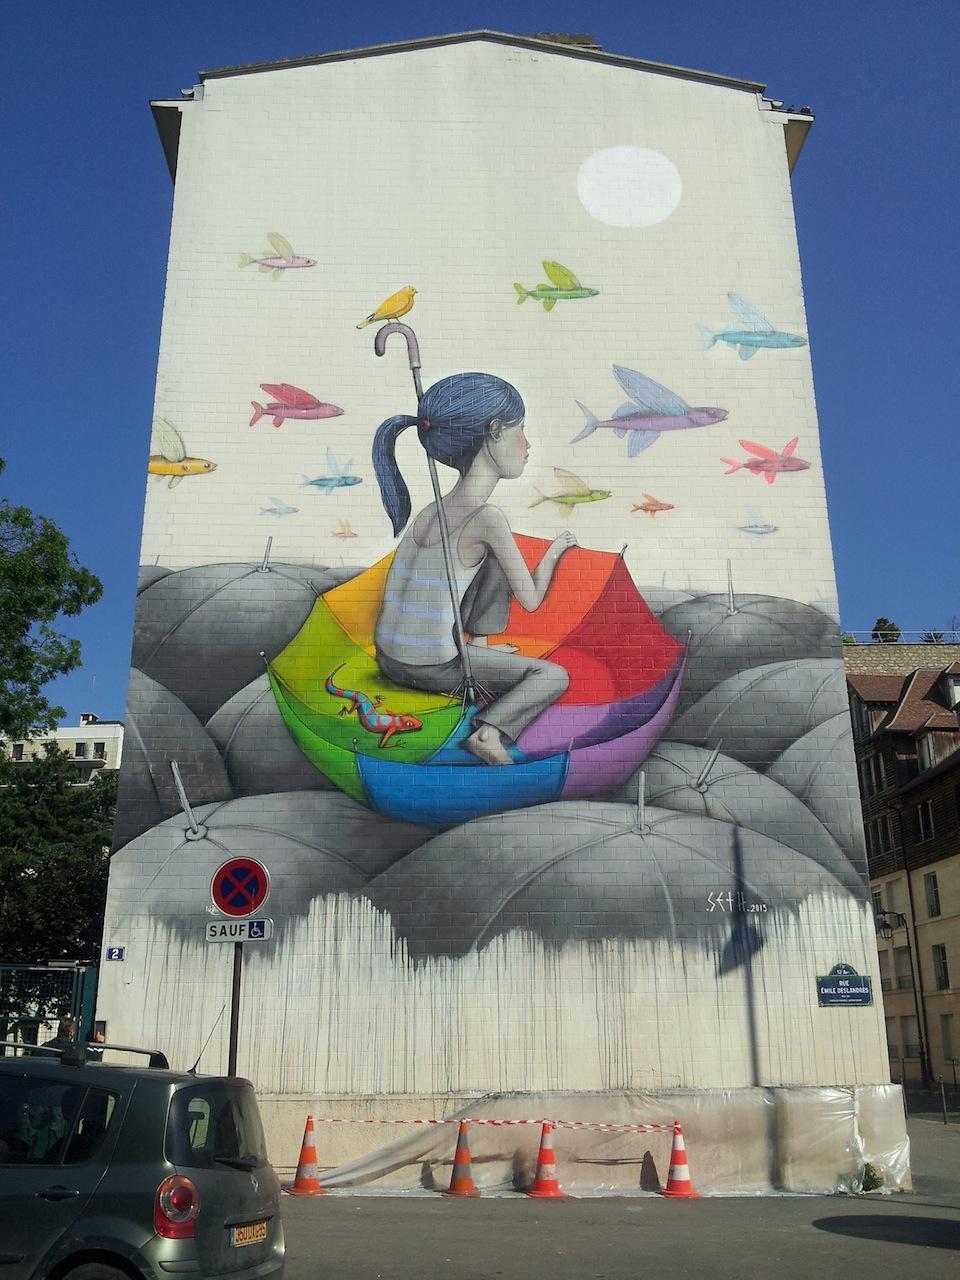 Fantásticas Obras de Arte Urbano Fantásticas Obras de Arte Urbano decorar una casa seth 1